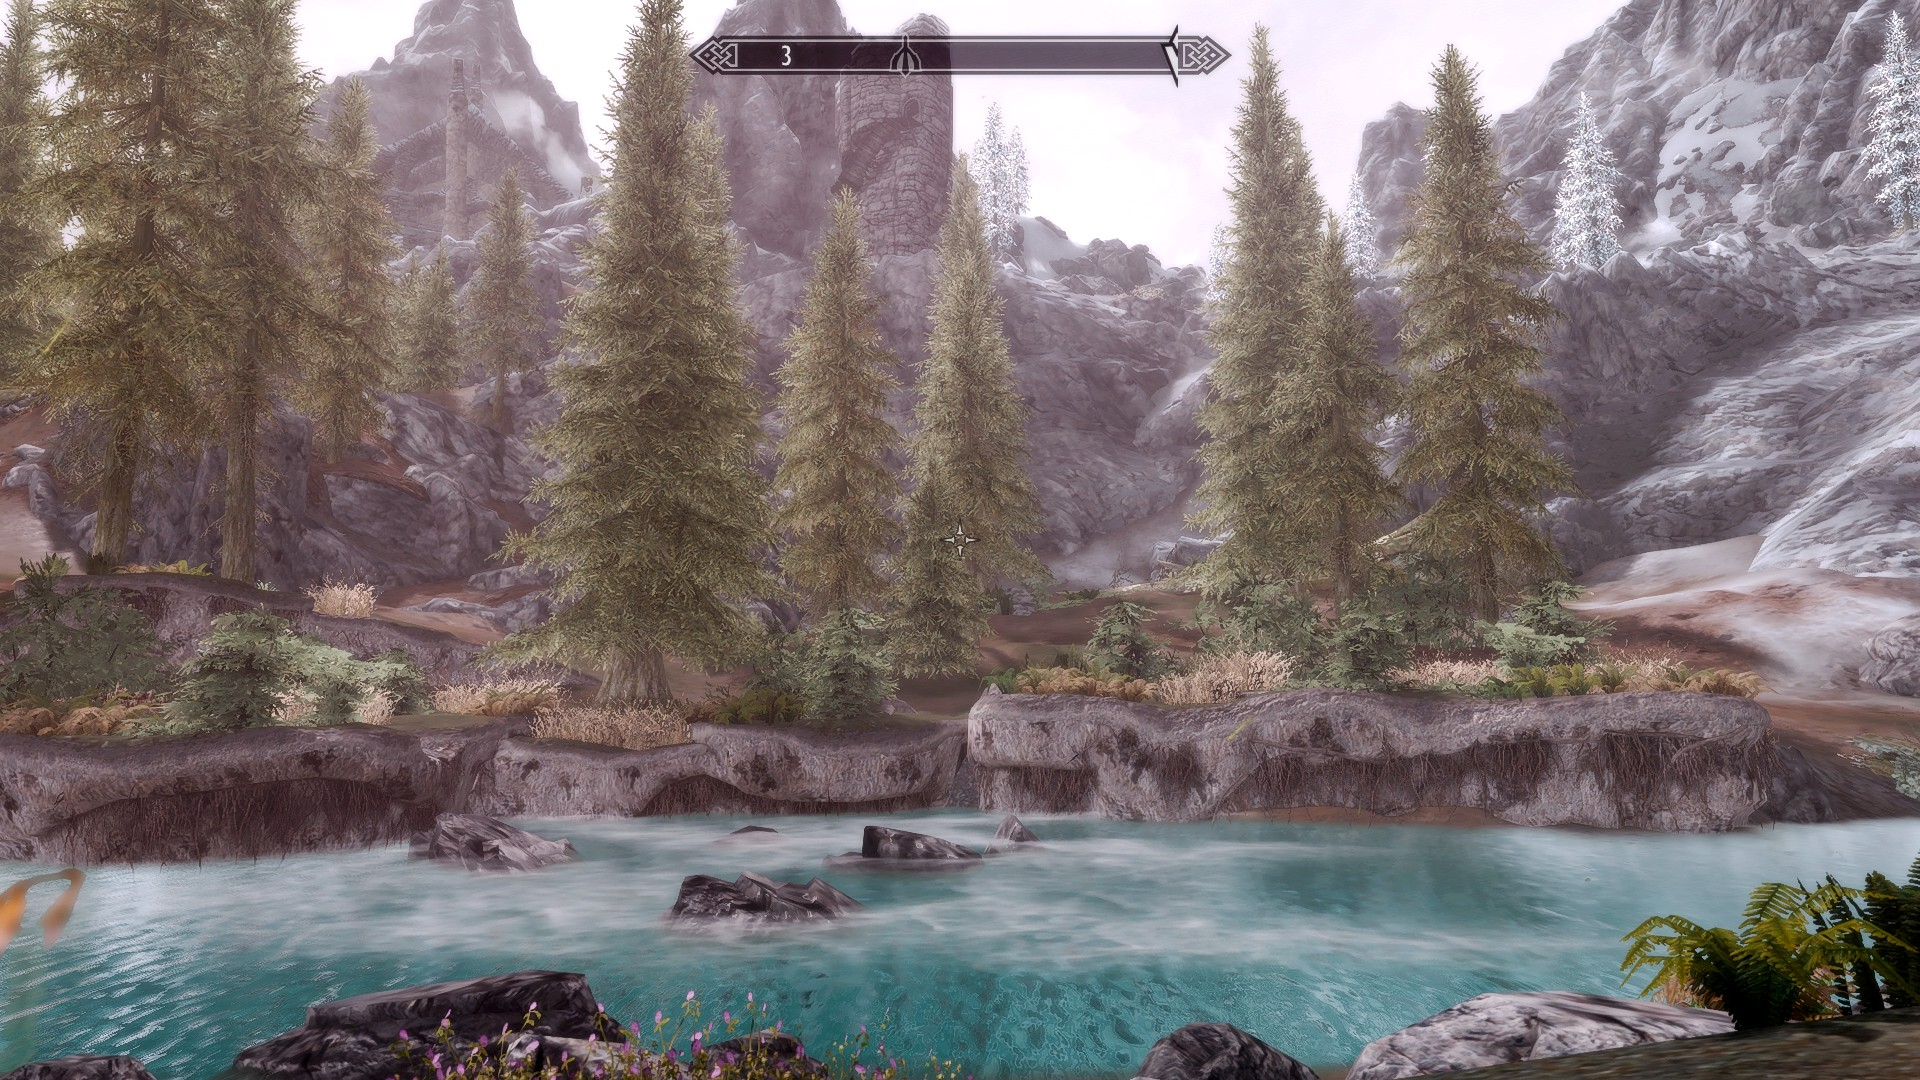 20171002111920_1.jpg - Elder Scrolls 5: Skyrim, the